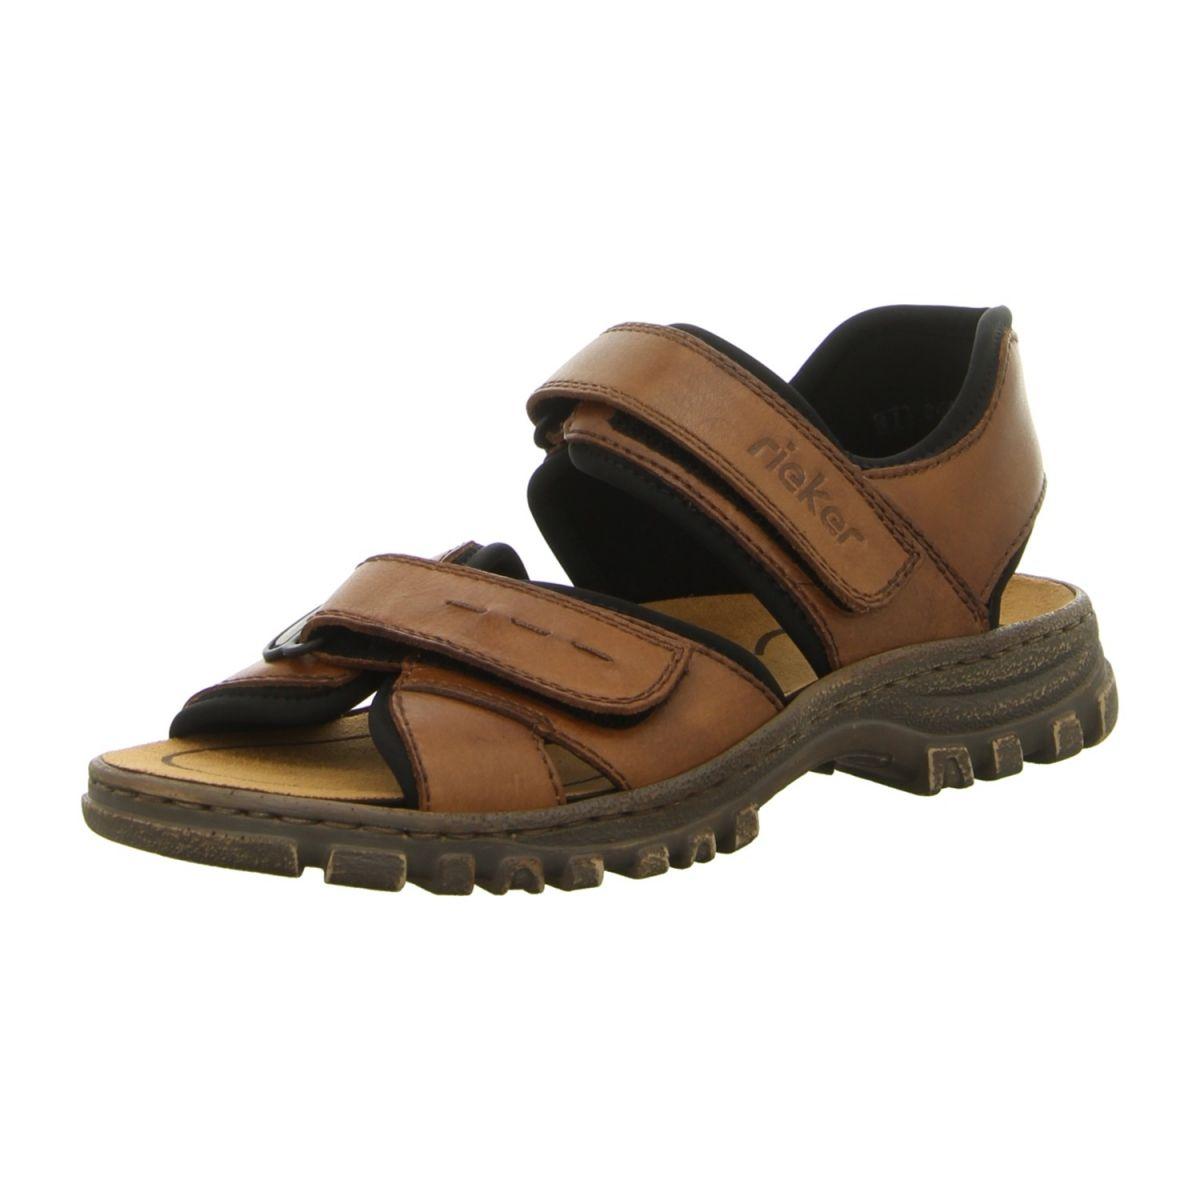 Rieker Herren Sandale in schwarz | SALE Schuhfachmann